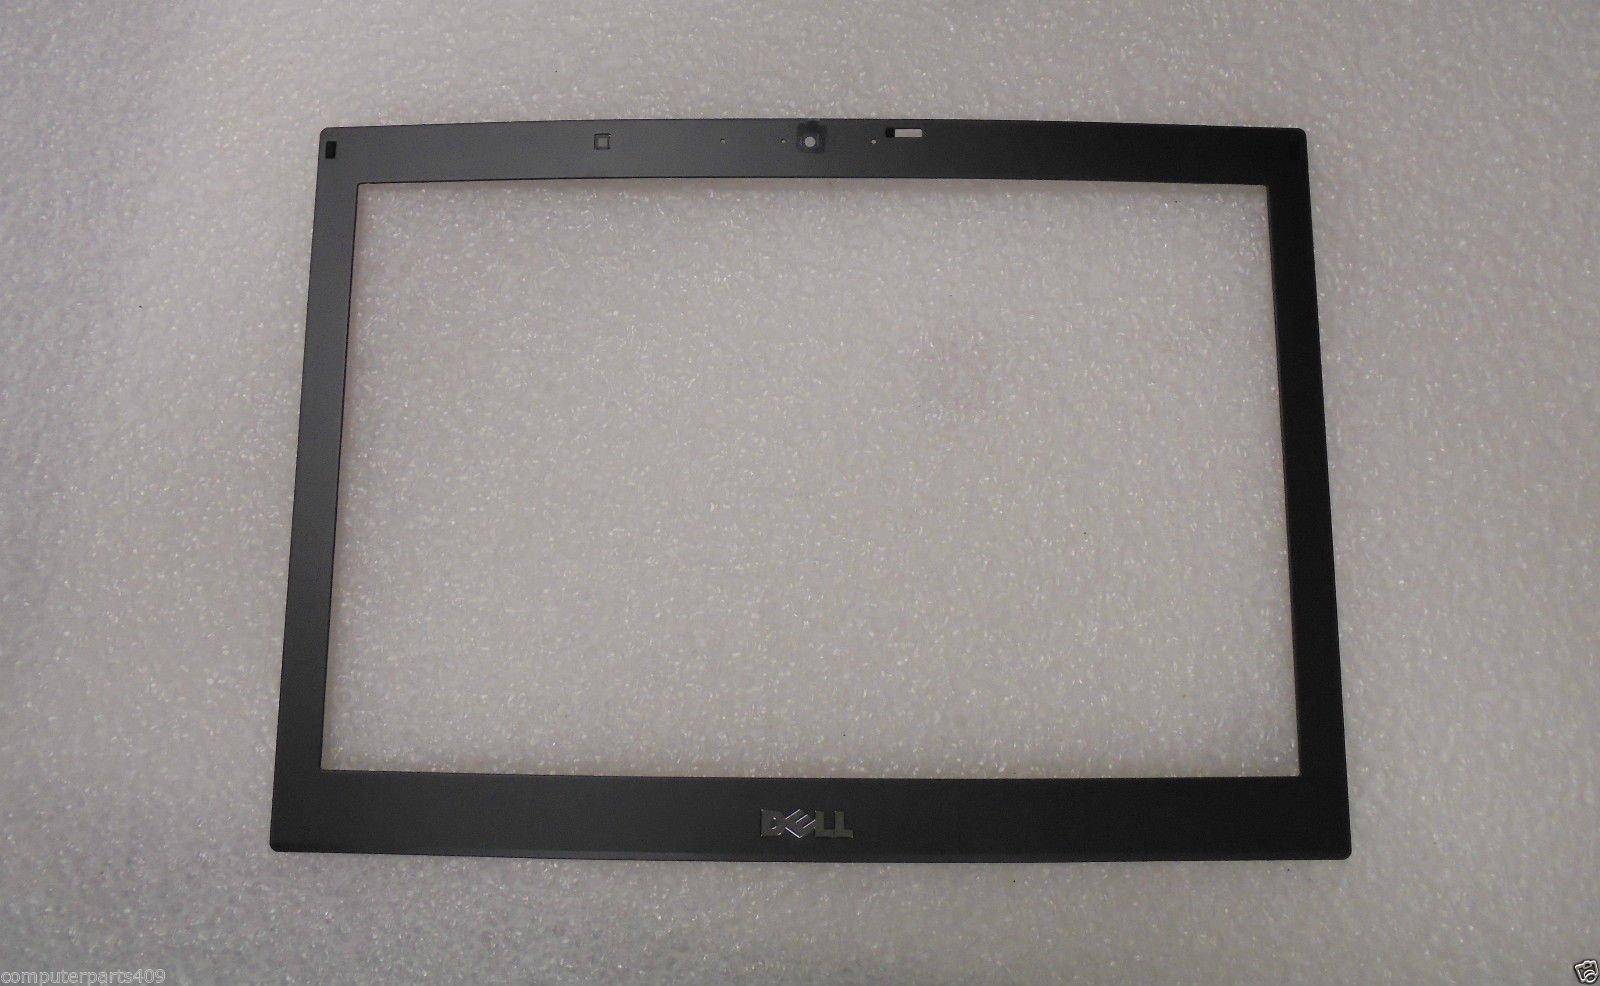 NEW Genuine OEM DELL Latitude E6410 14.1 Inch Display Screen Black Front Frame Housing Cover Enclosure Trim Bezel W/Web Camera Port Hole LCD BEZEL DJWJD